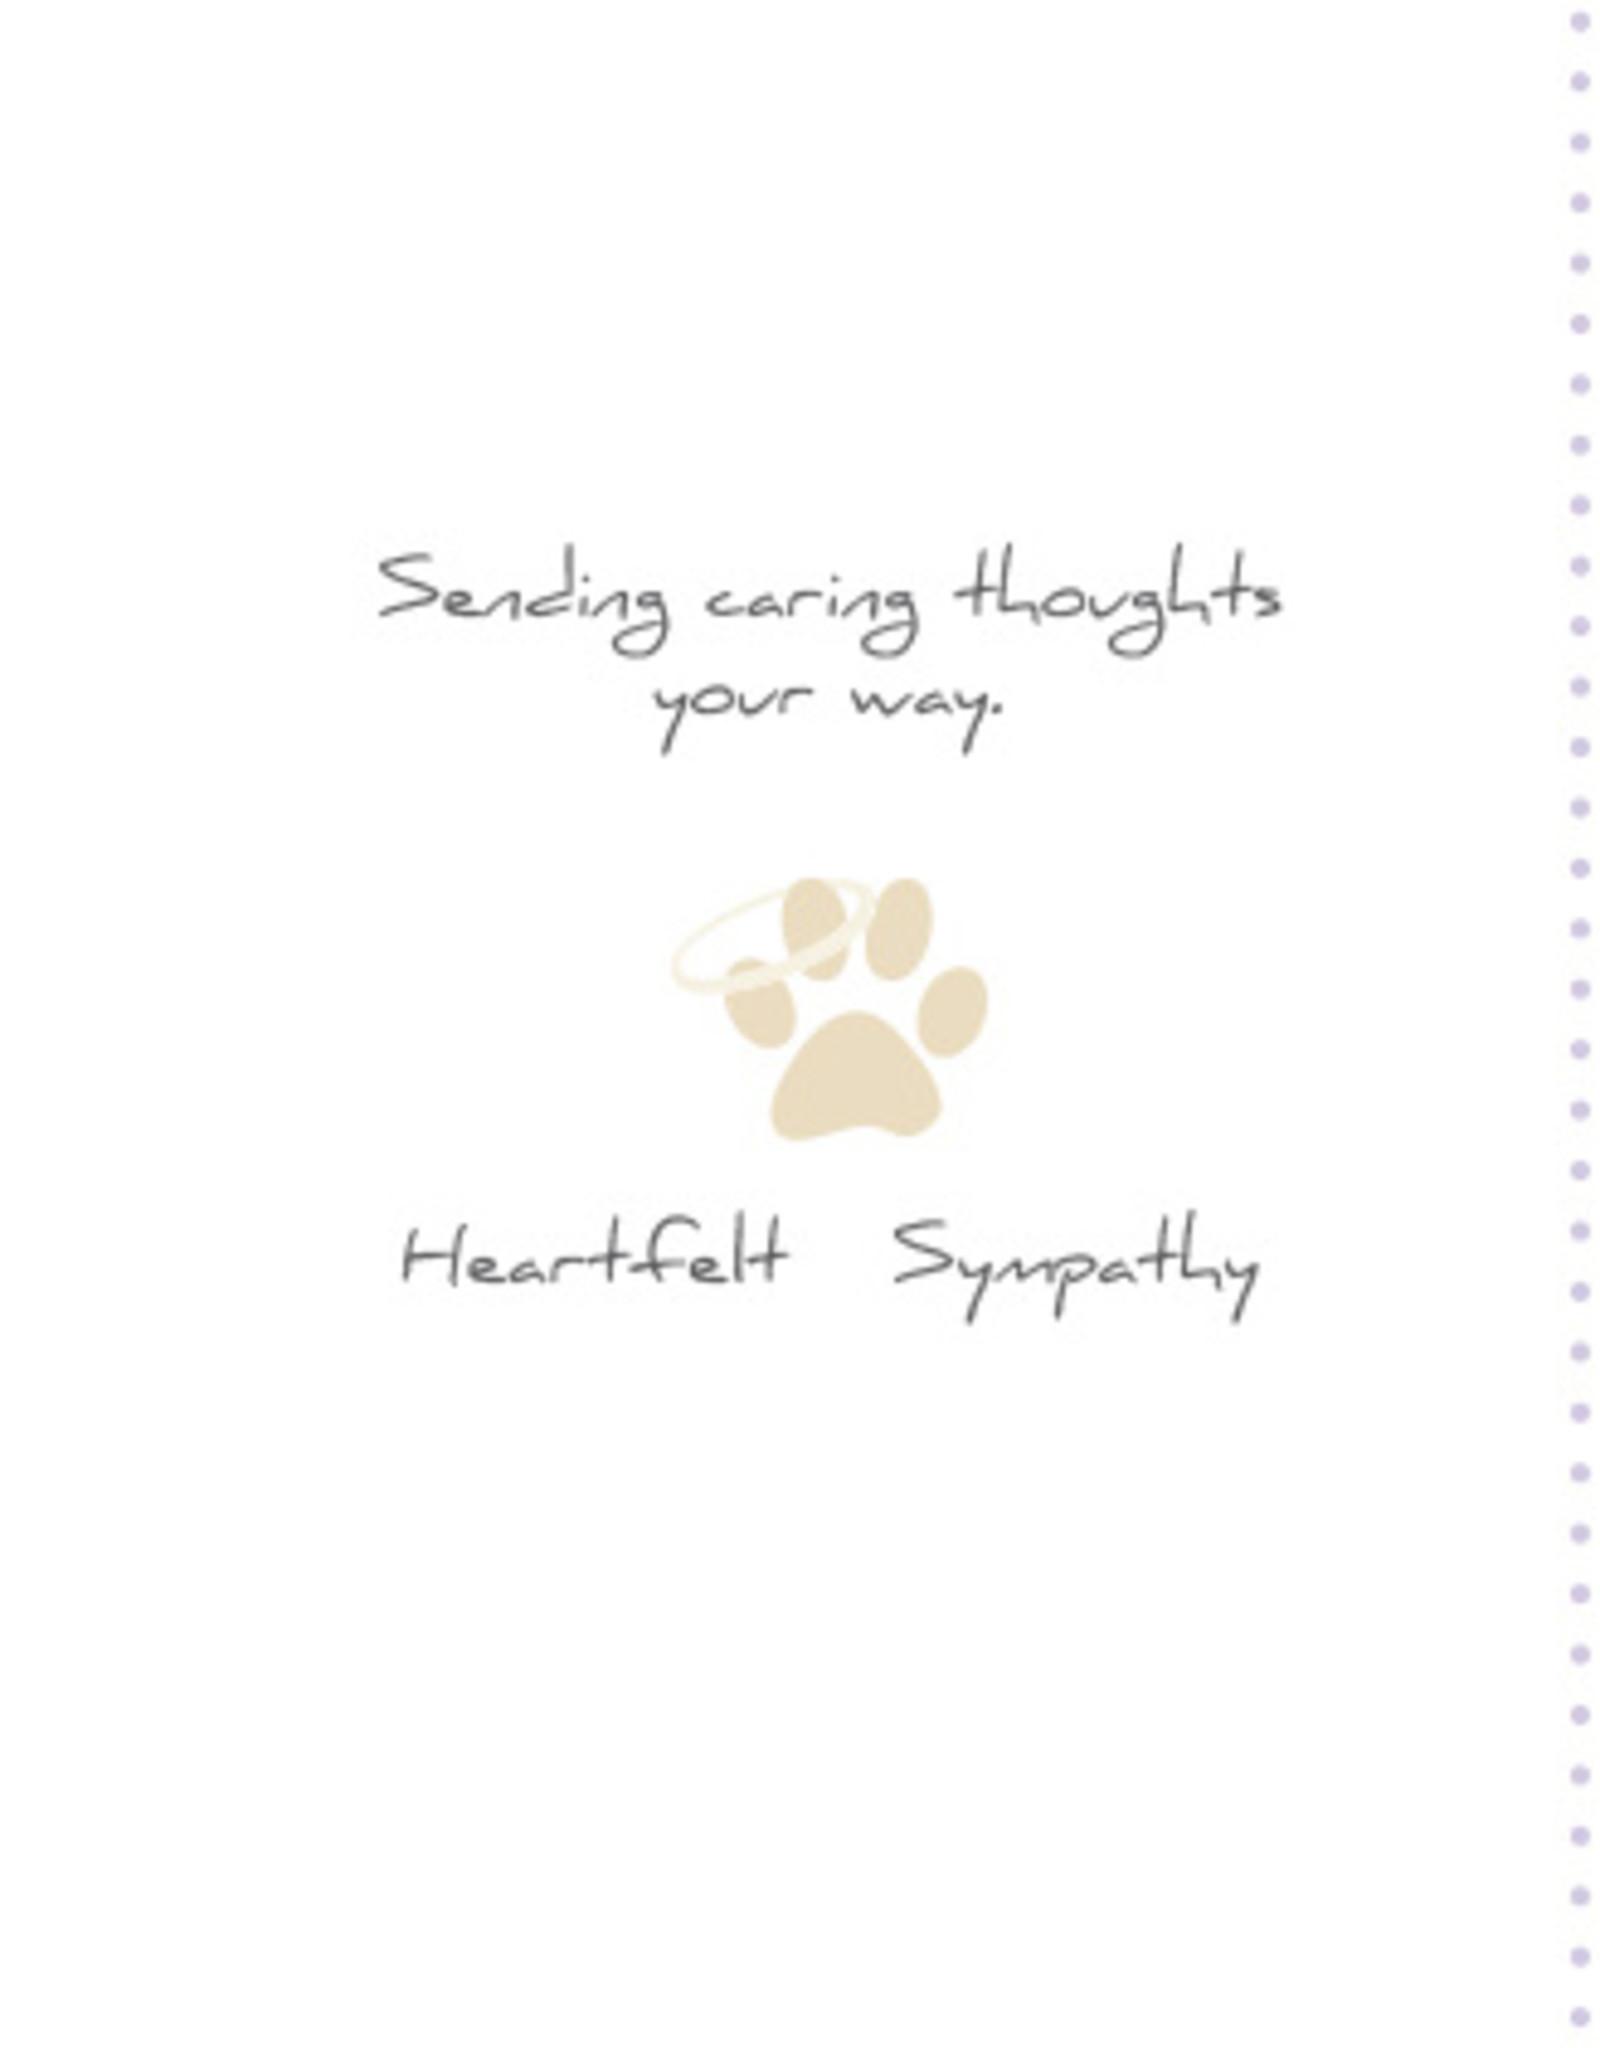 DOG SPEAK Purple Pawprint Dog Sympathy Greeting Card